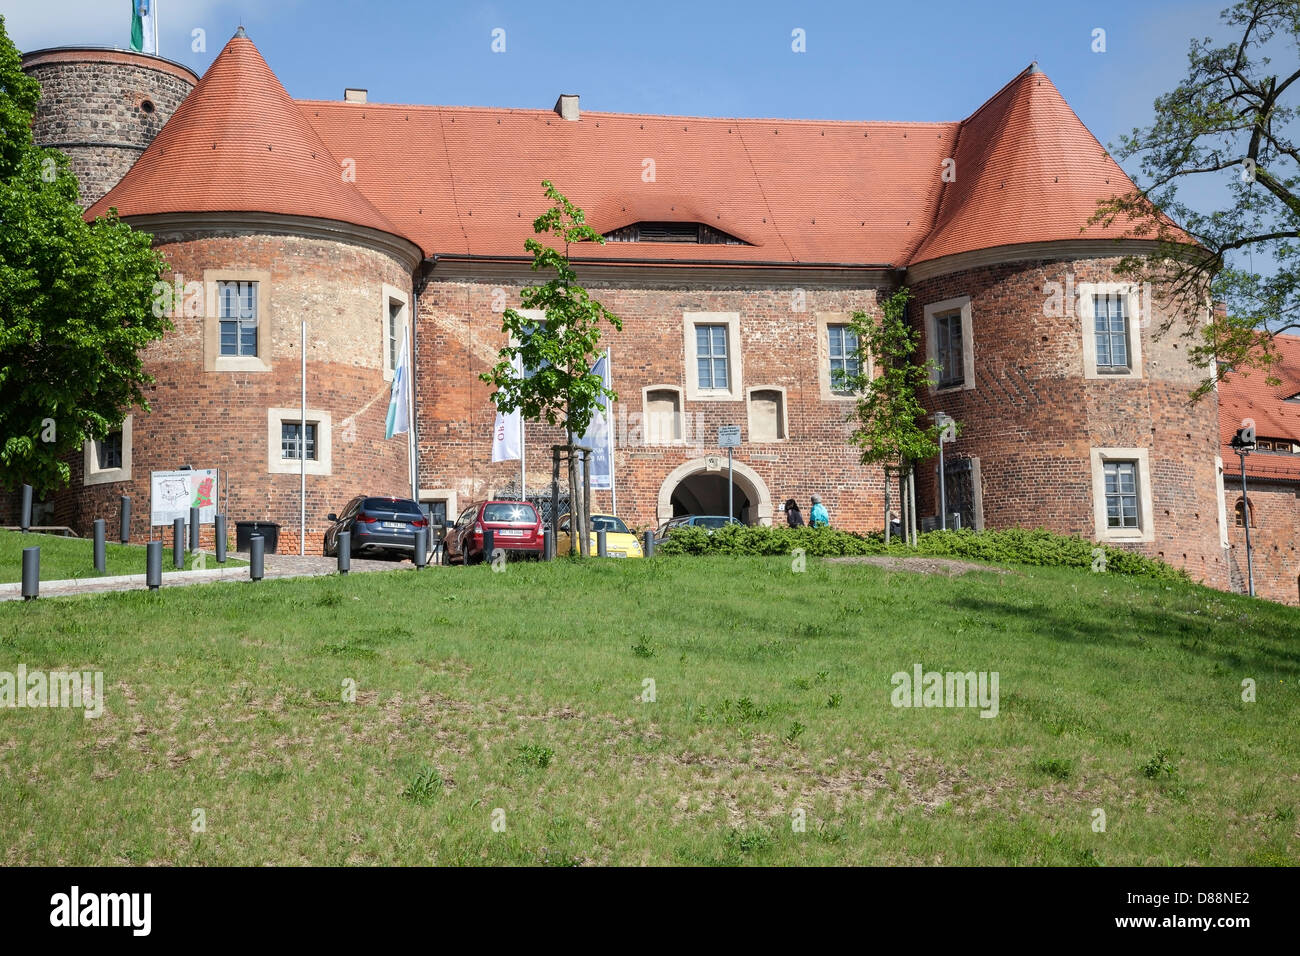 burg eisenhardt bad belzig hoher fl ming brandenburg germany stock photo 56740826 alamy. Black Bedroom Furniture Sets. Home Design Ideas